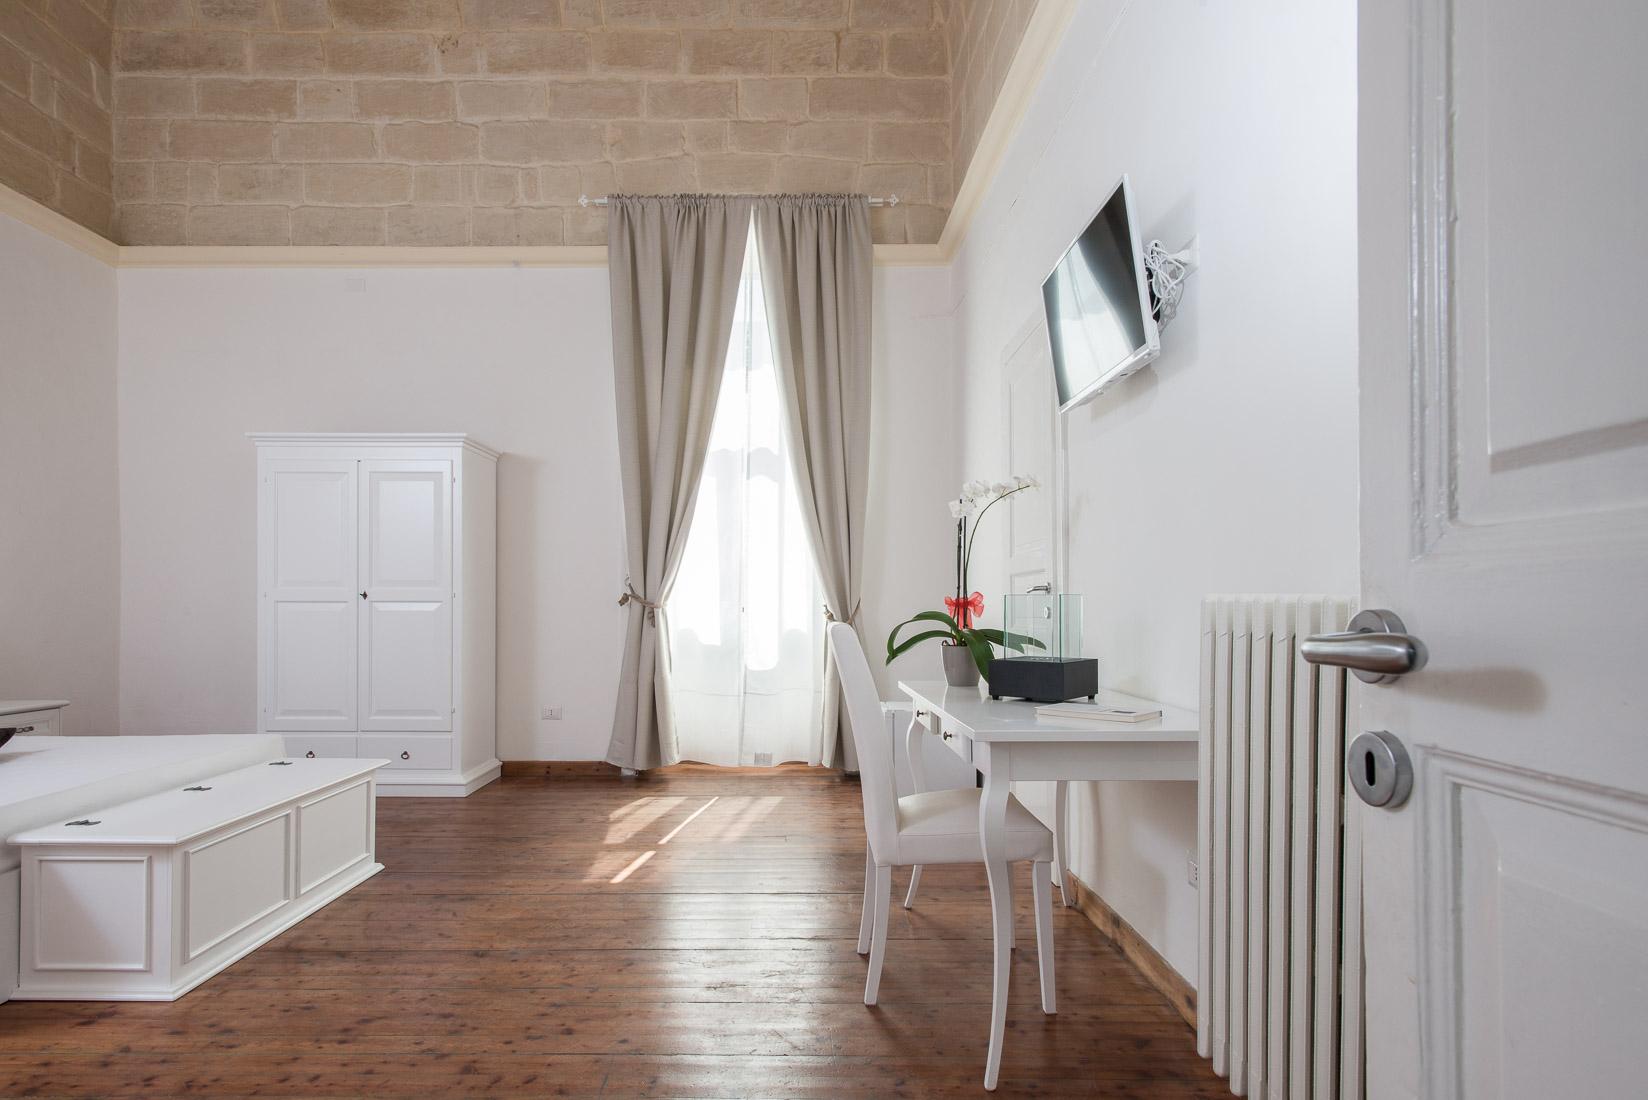 https://www.orlandinifrancesco.com/wp/wp-content/uploads/2019/01/Ada-Suite-Lecce-2.jpg